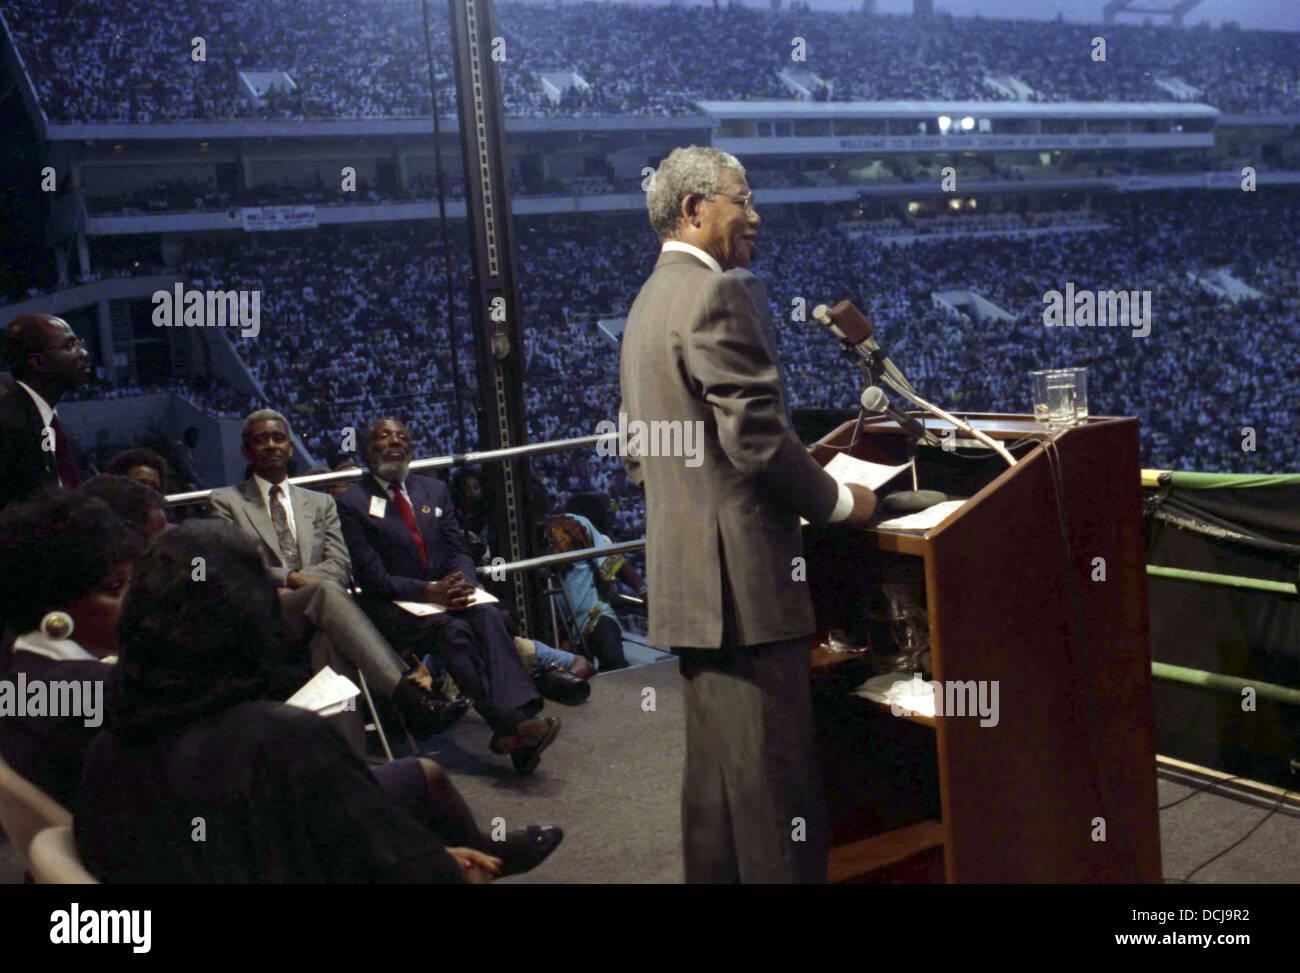 Nelson Mandela speaking to thousands of people at Georgia Tech Stadium in Atlanta, Georgia. - Stock Image